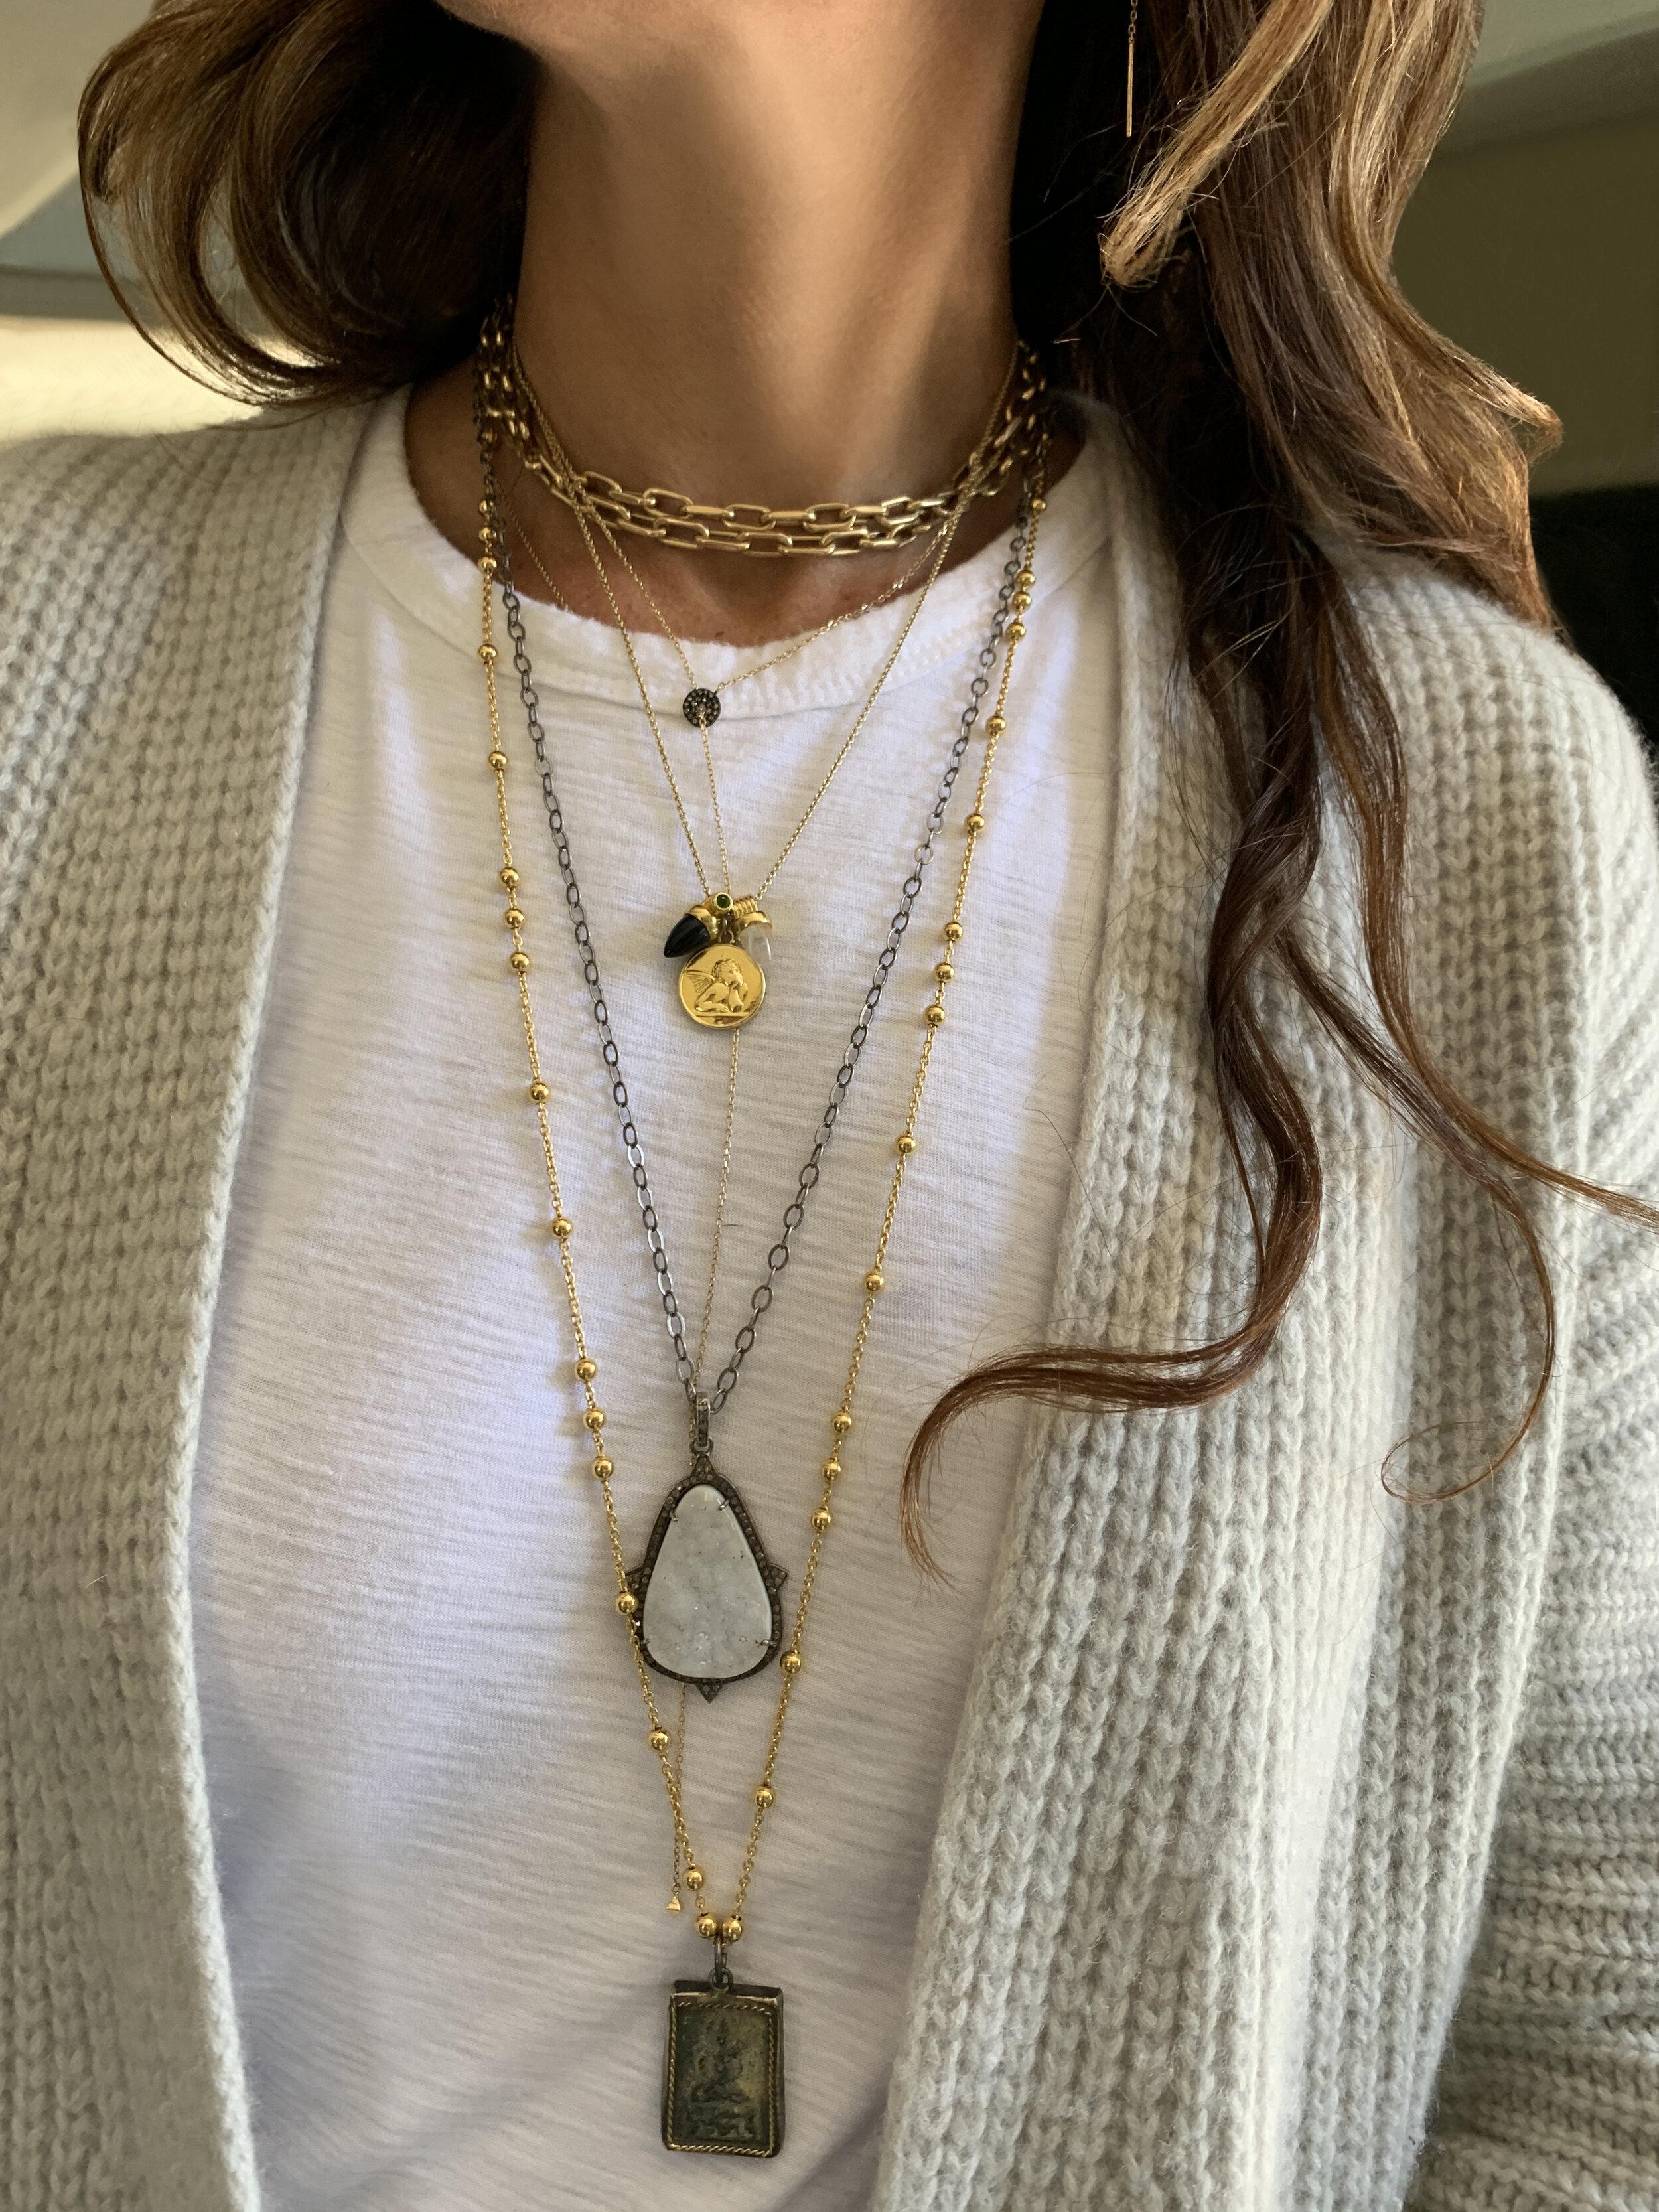 Anné Gangel Designs fine jewelry, click to explore